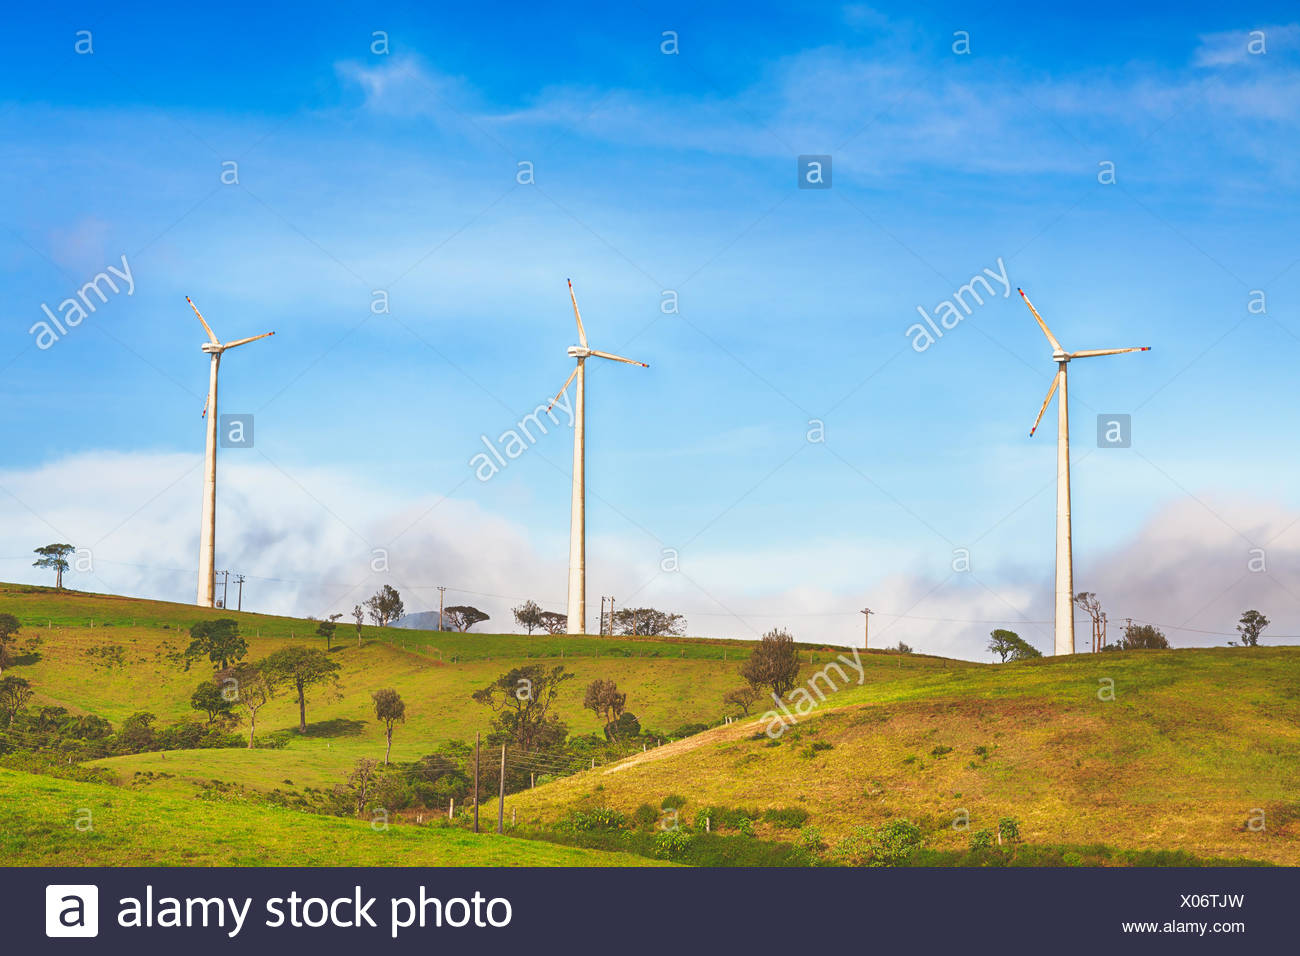 Horizontalen Achse Windkraftanlagen Stockbild